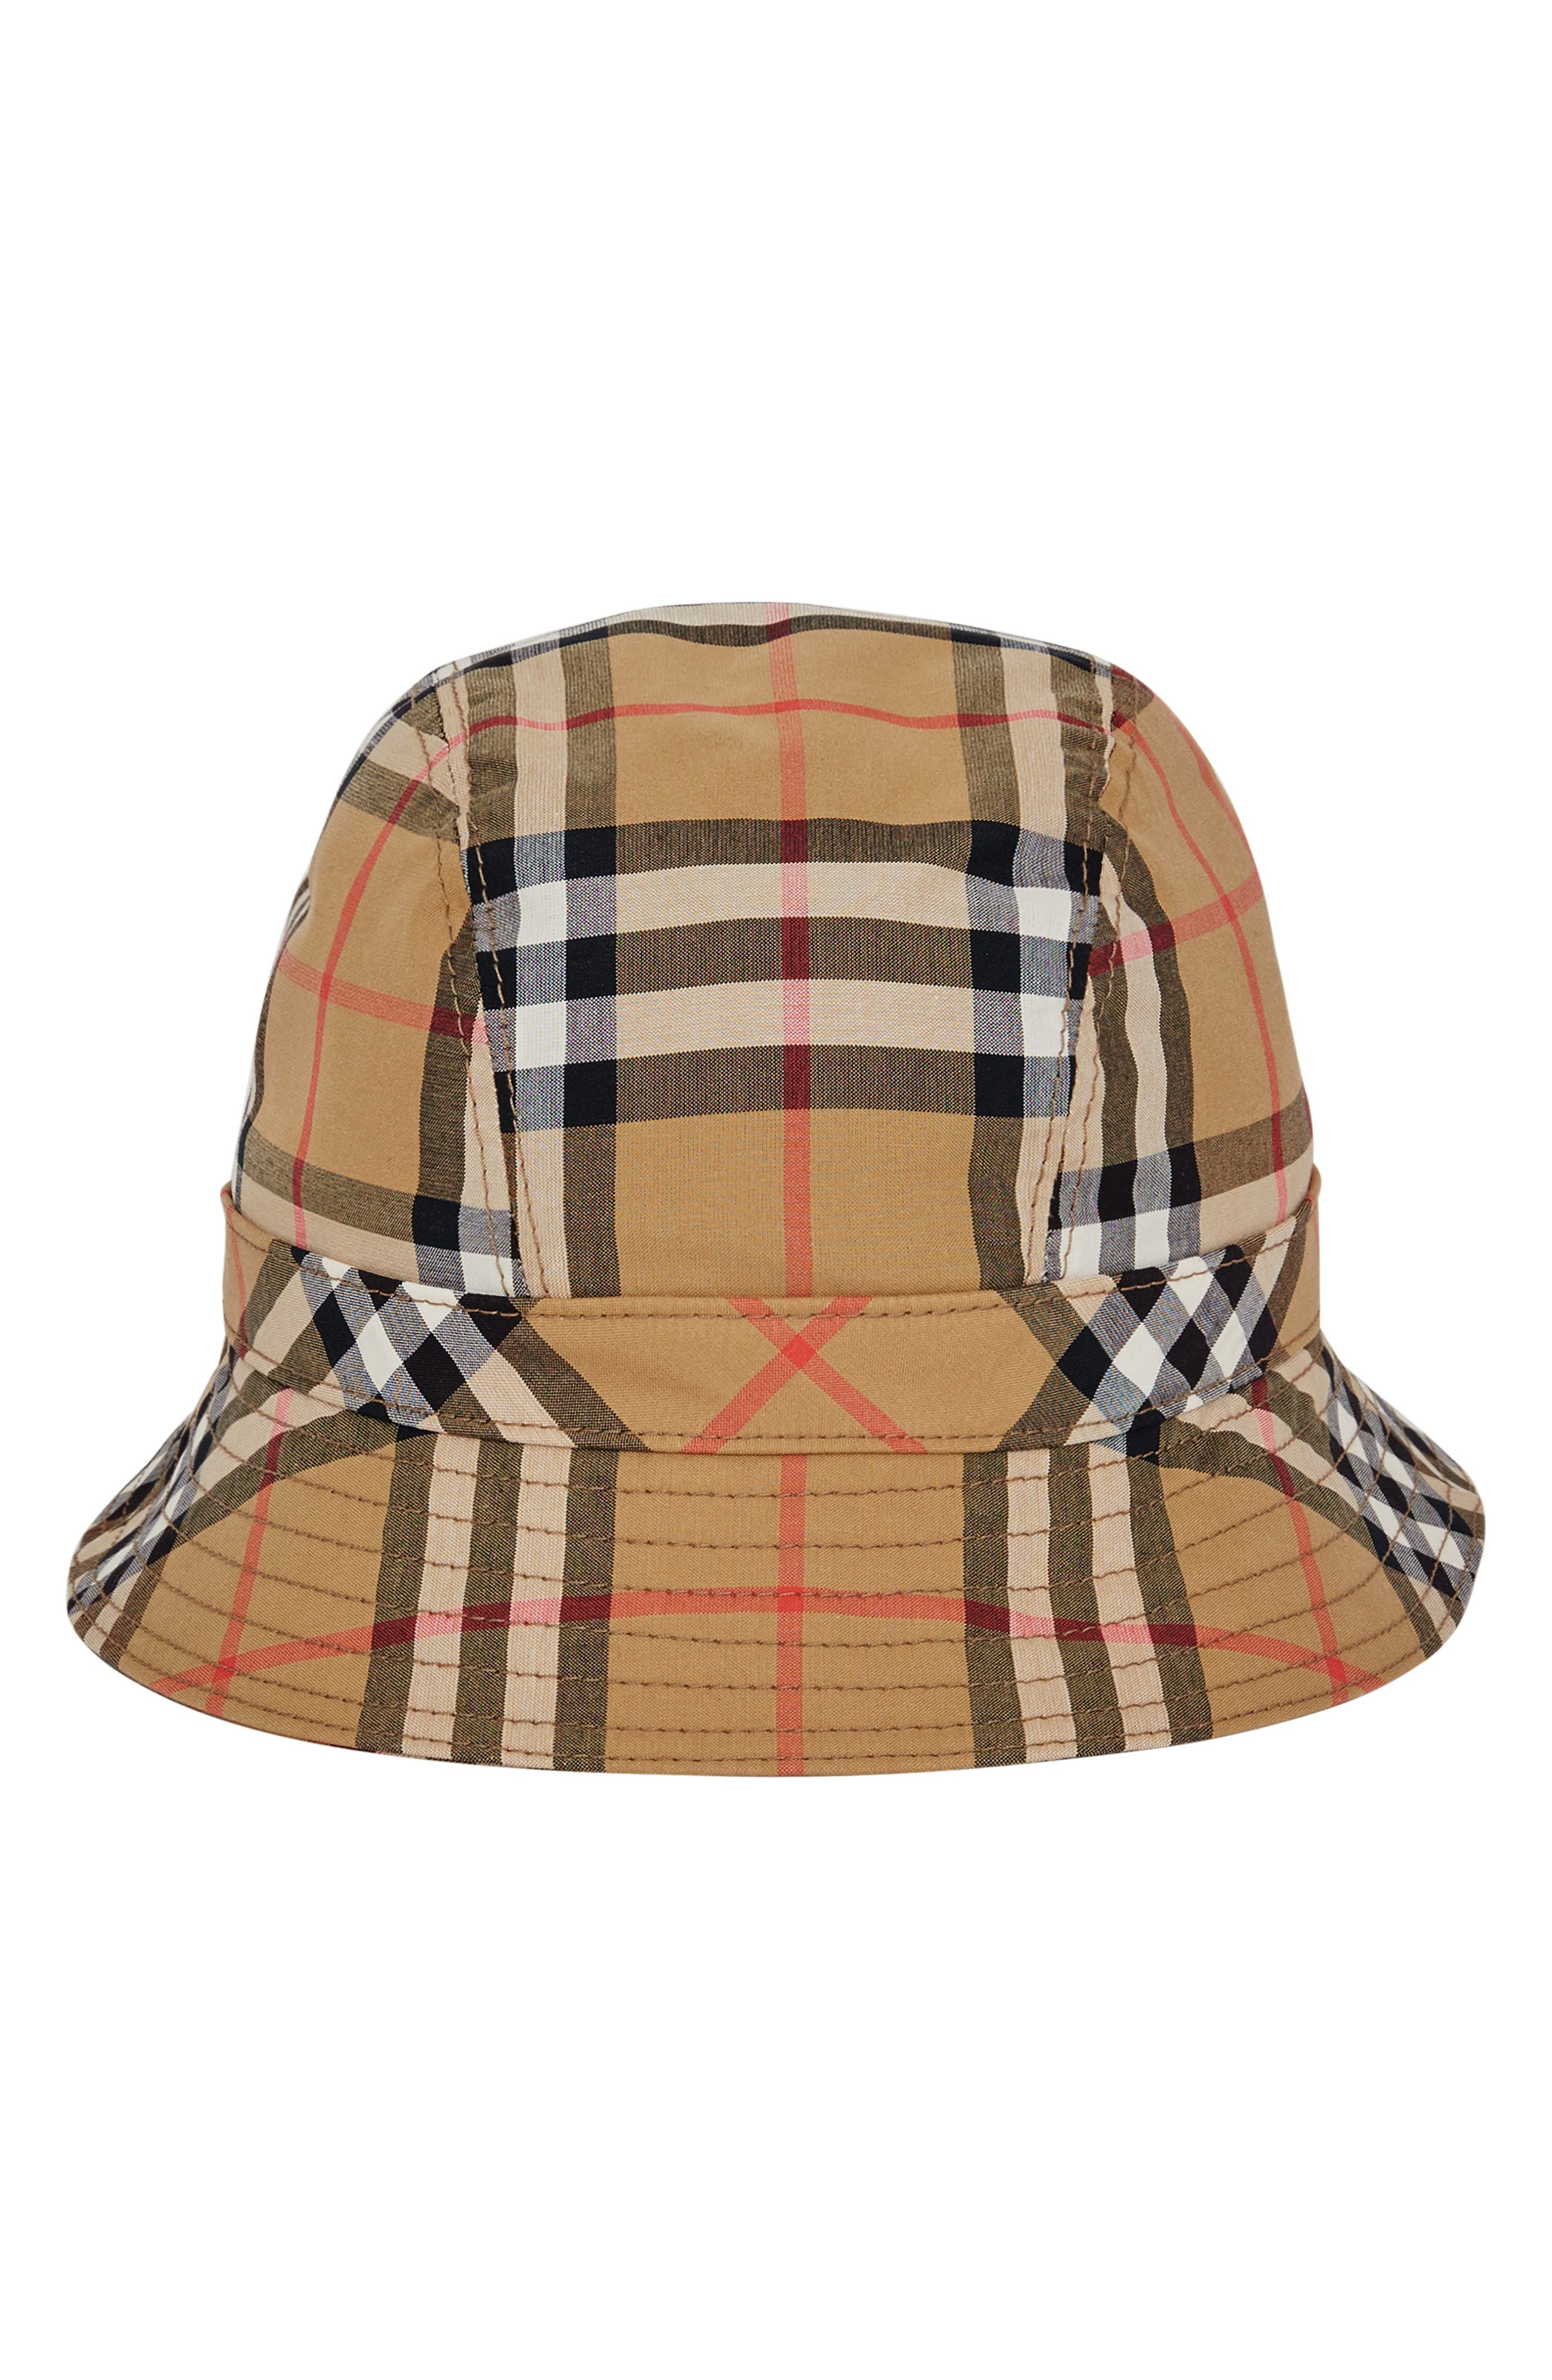 Rainbow Stripe Vintage Check Bucket Hat,                             Alternate thumbnail 2, color,                             ANTIQUE YELLOW/ RAINBOW